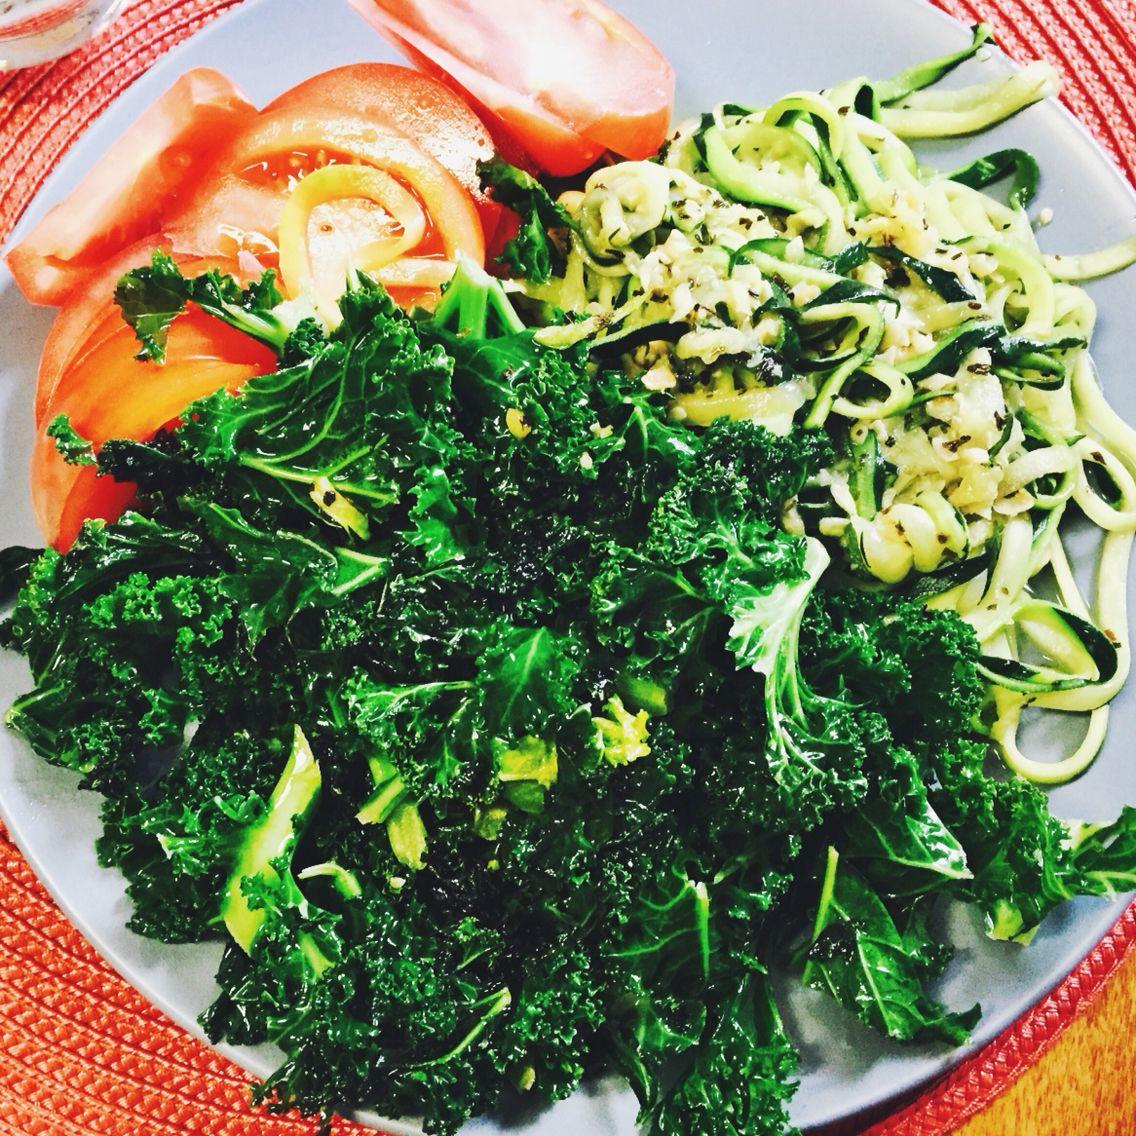 Zucchini spaghetti, cooked kale and fresh tomatoes!